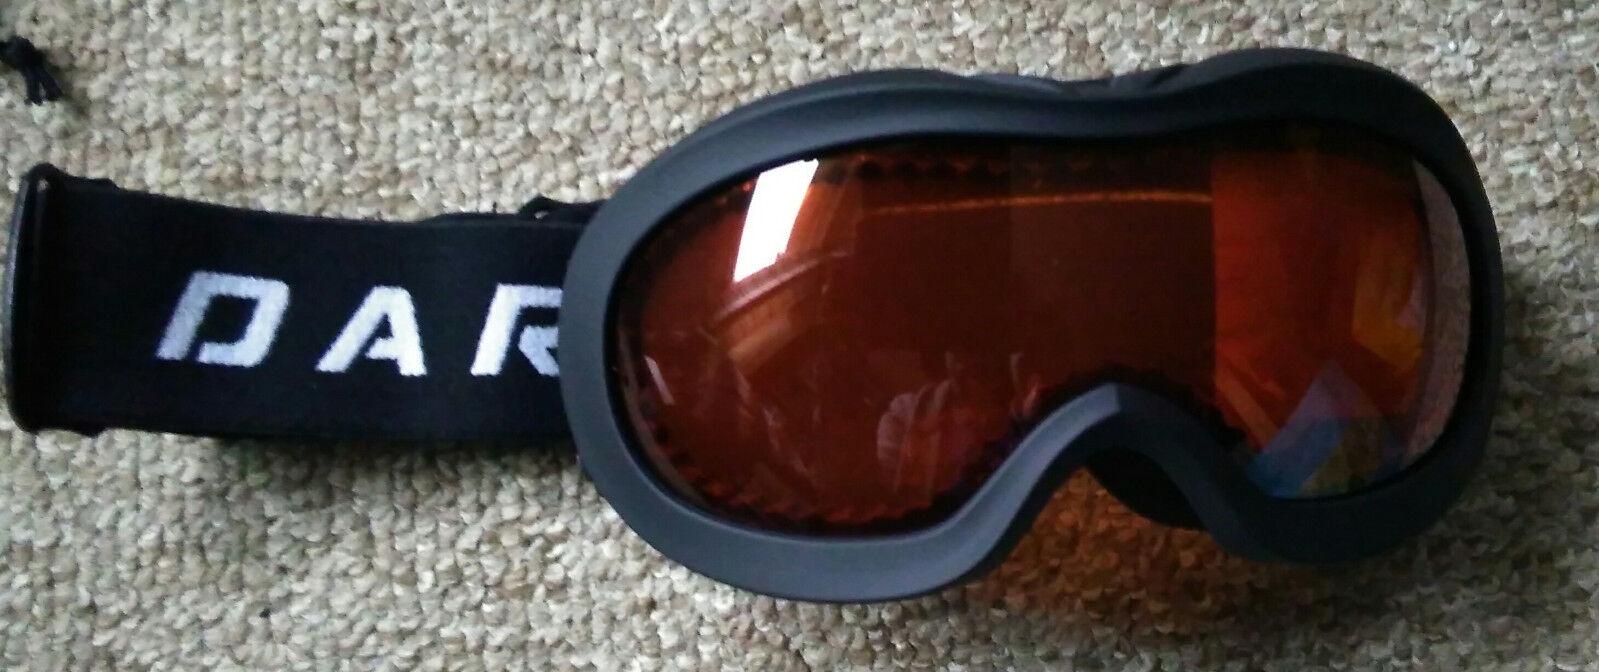 Velose junior ski goggles girls-Dare 2b-anti fog-Brand new in box